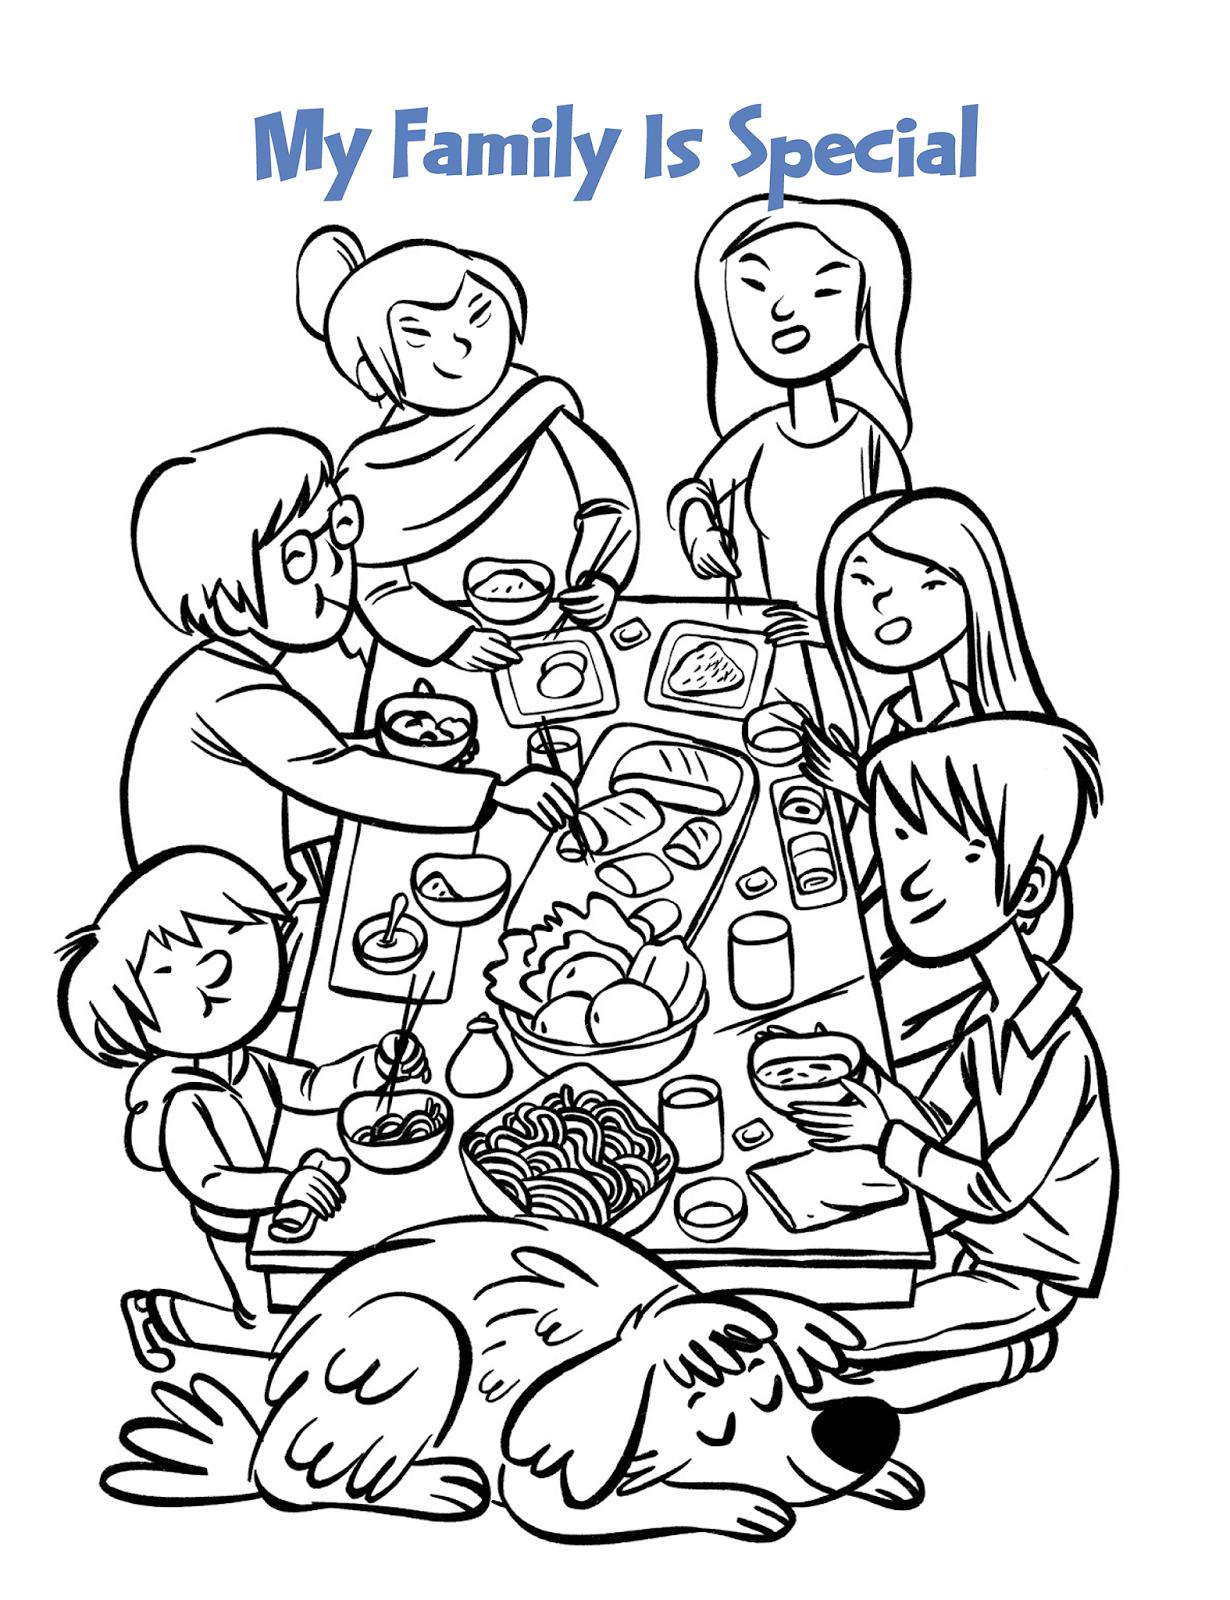 Lebih Dari 100 Gambar Untuk Mewarnai Tema Keluarga